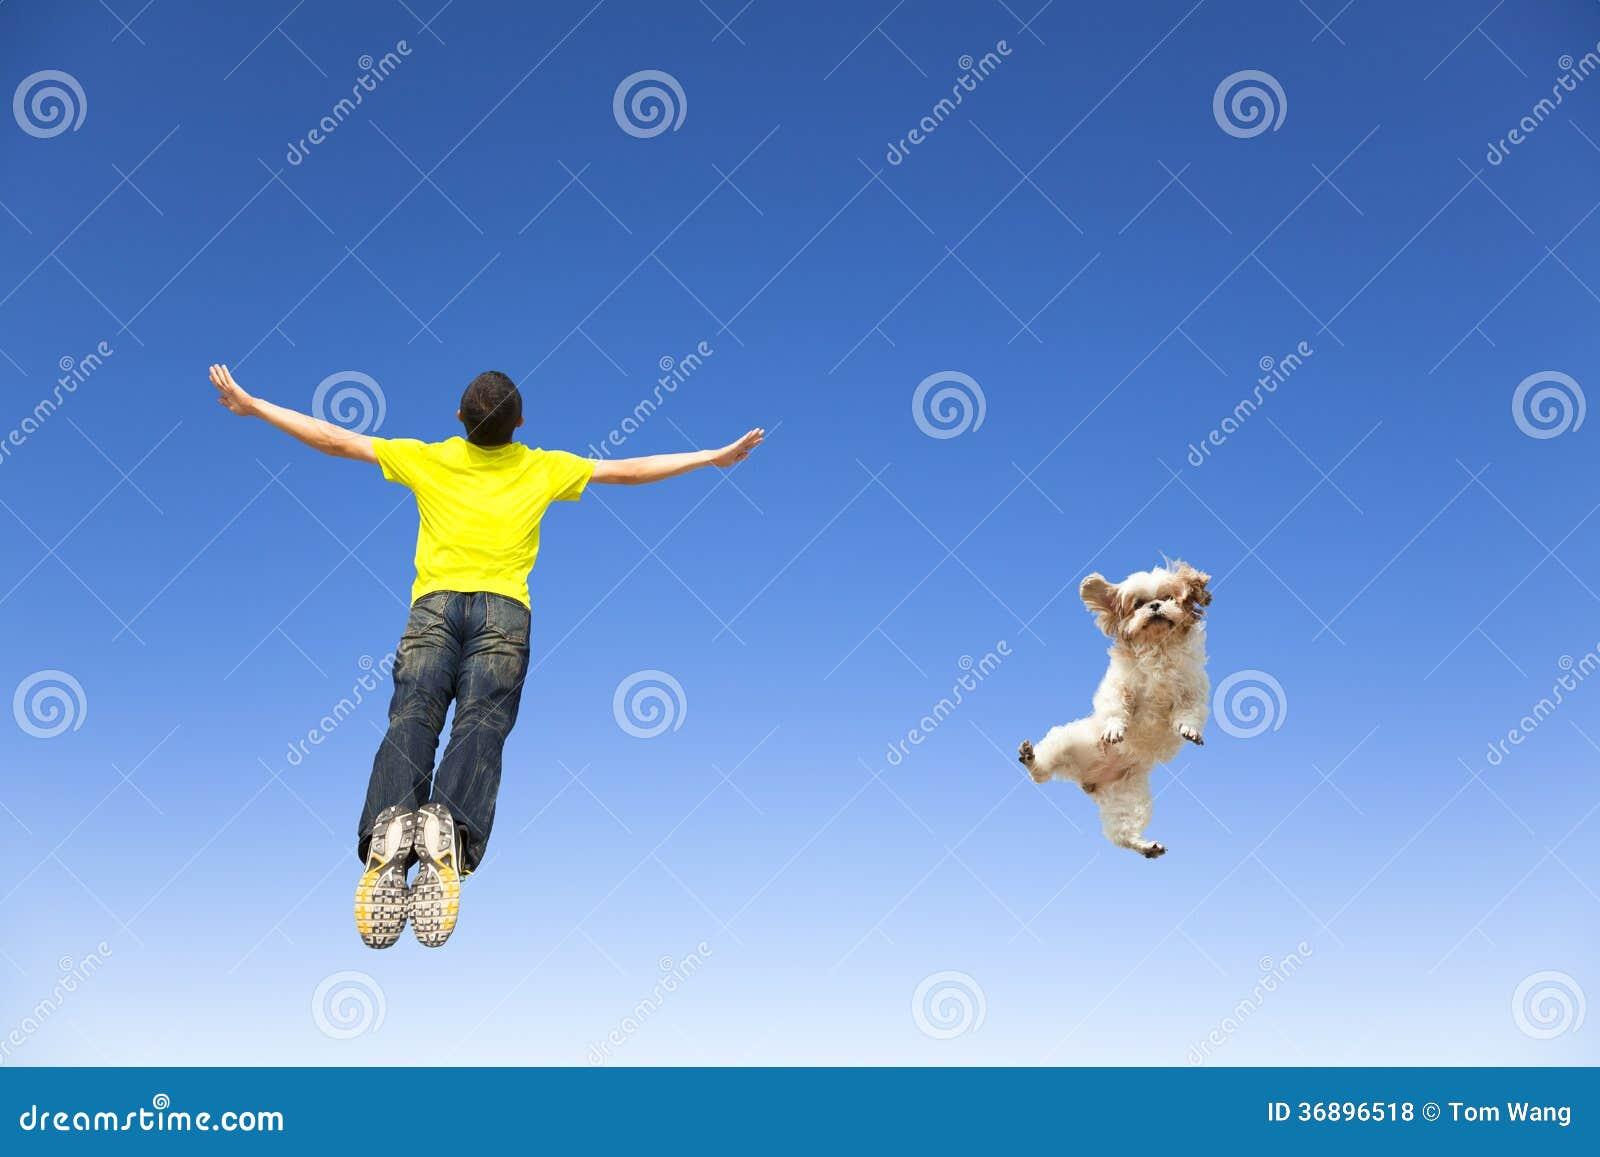 Giovane e cane che saltano nel cielo